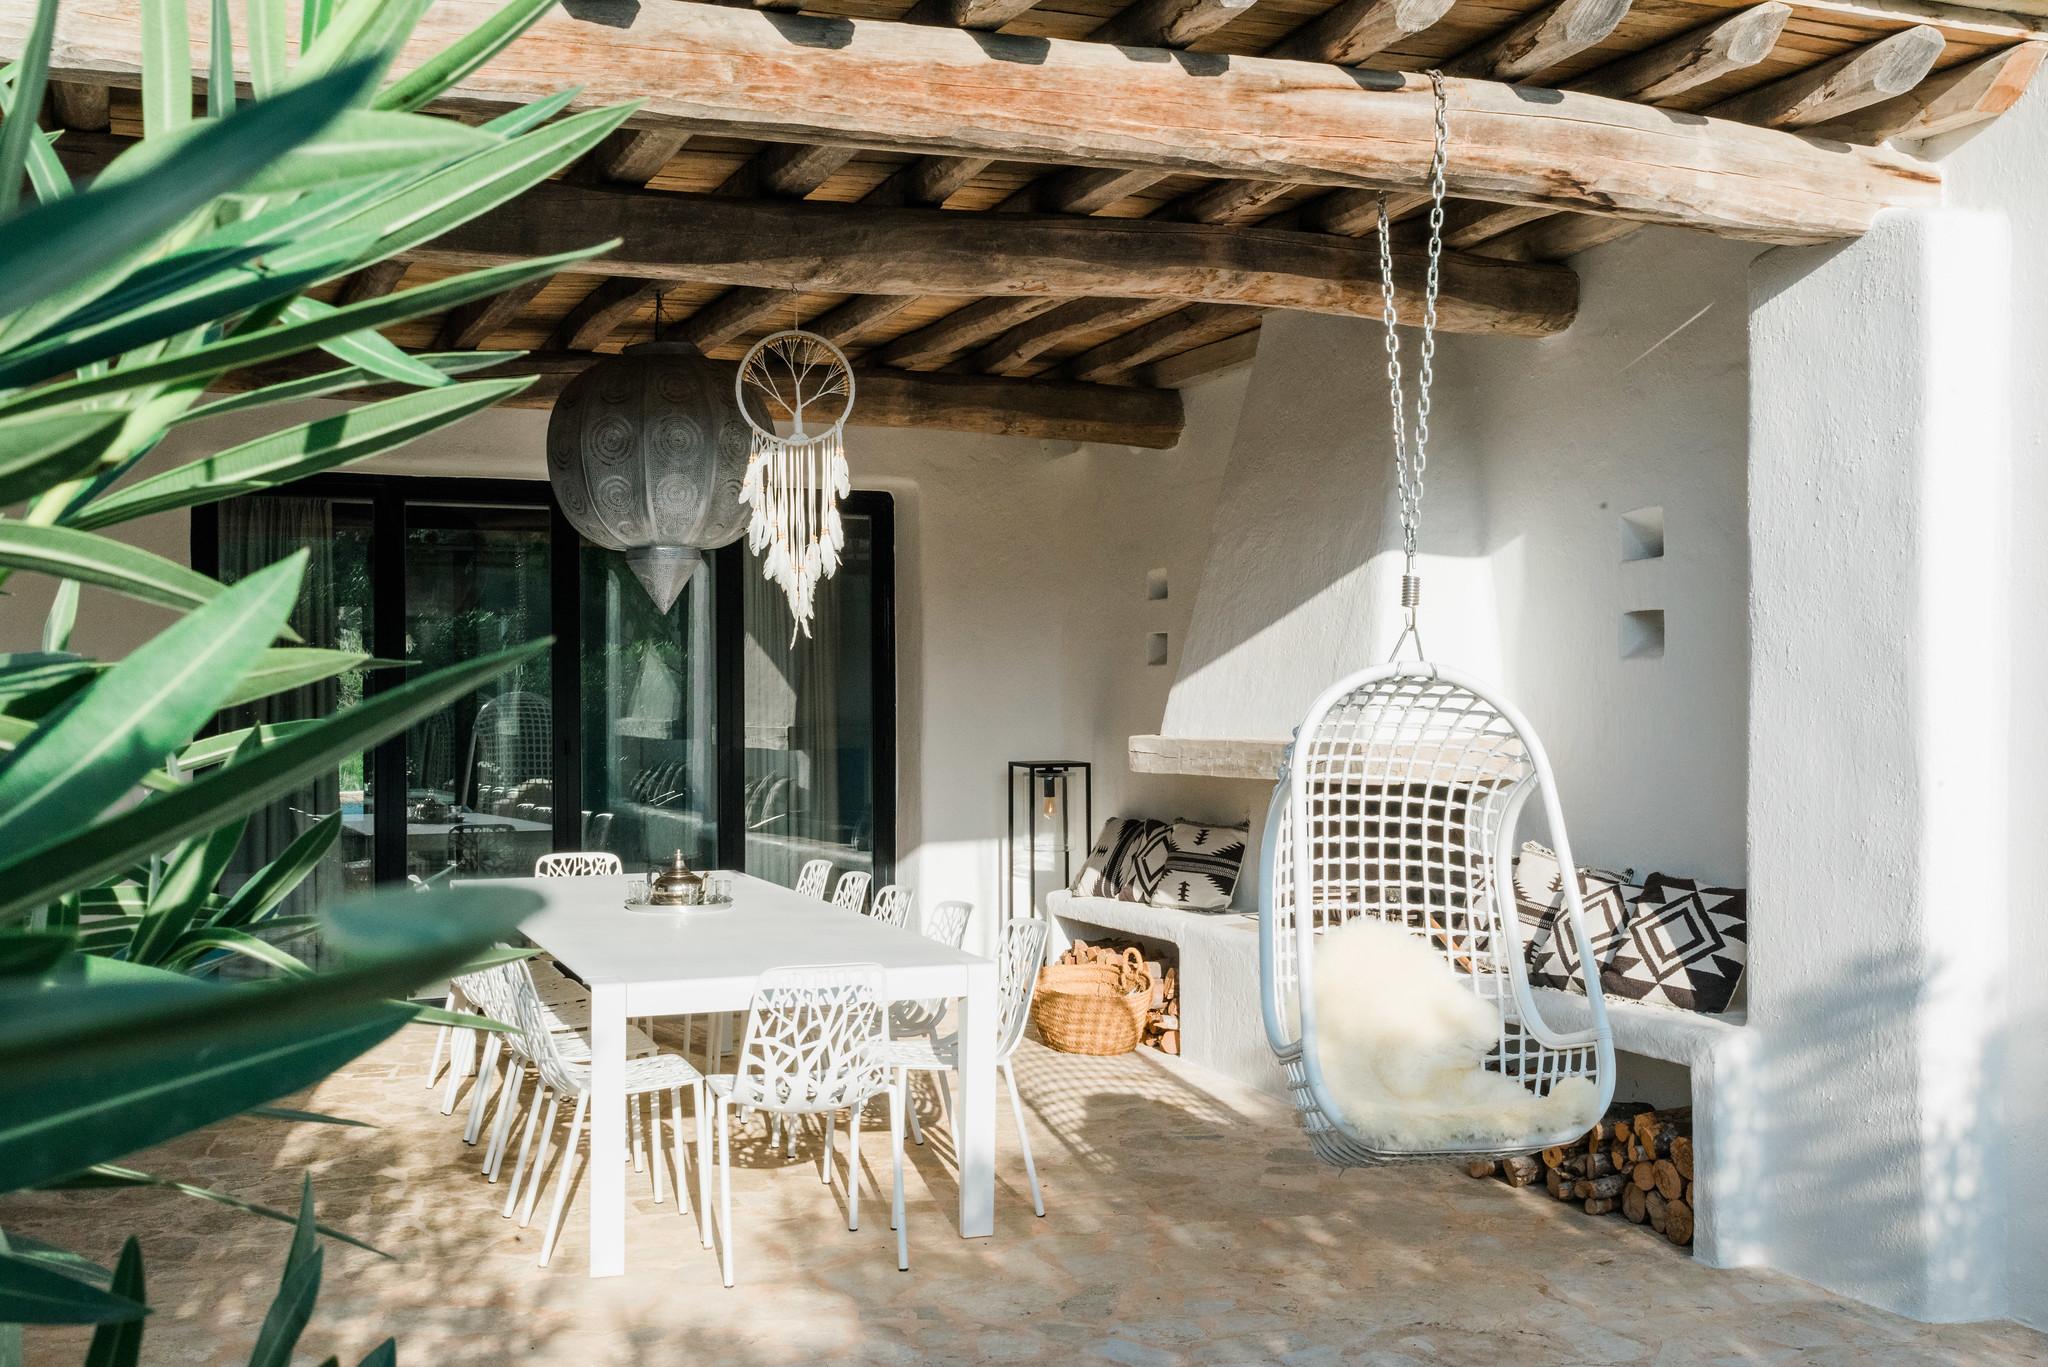 https://www.white-ibiza.com/wp-content/uploads/2020/05/white-ibiza-villas-can-terra-outside-seating.jpg